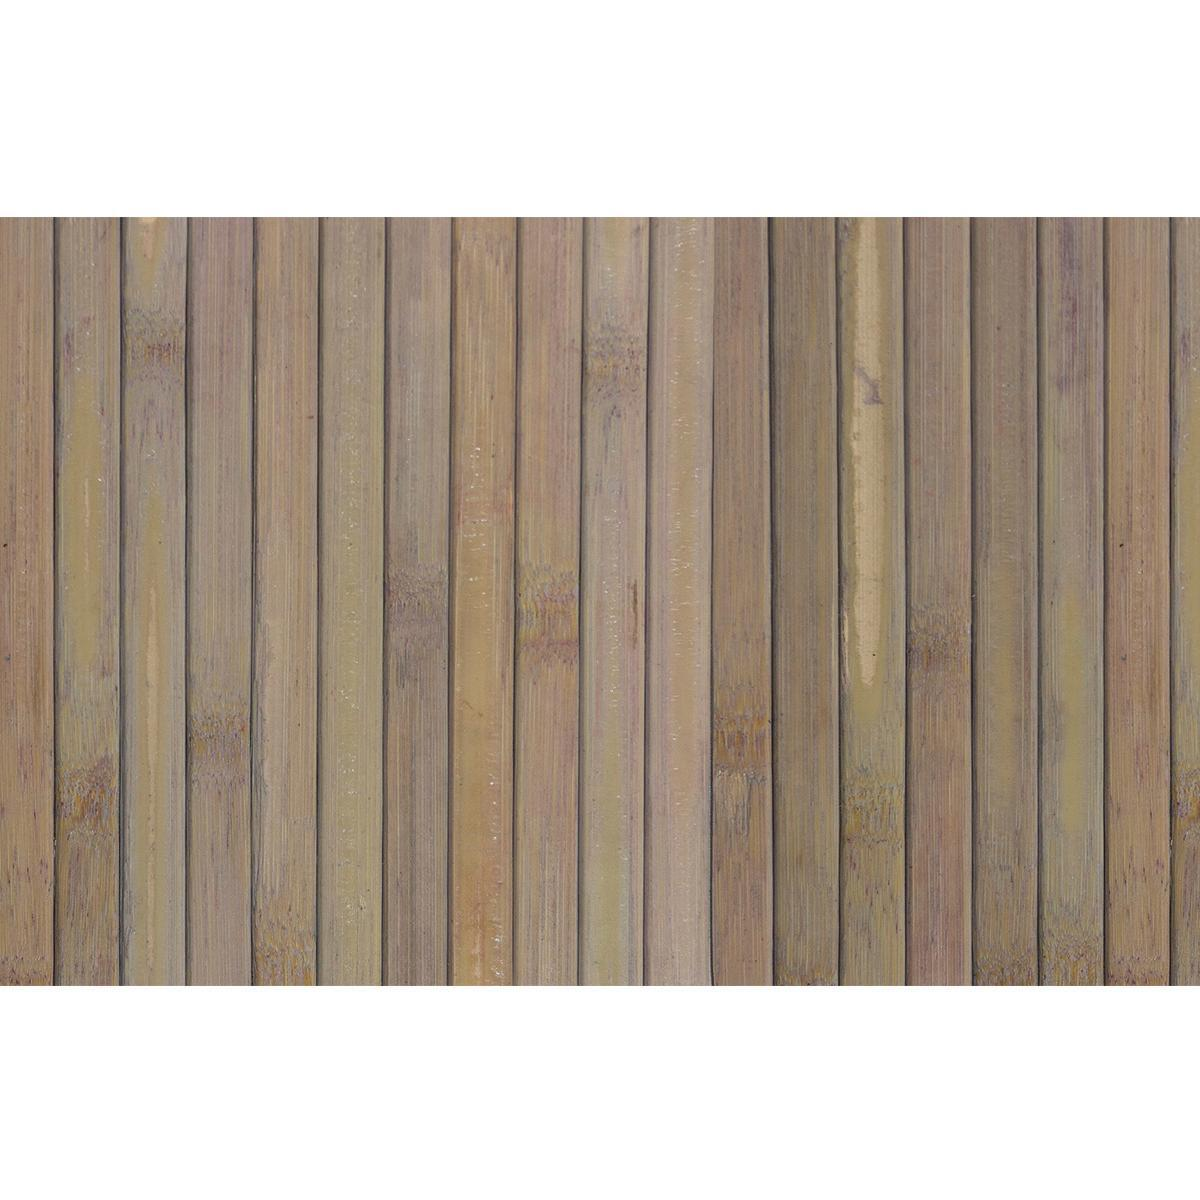 Passatoia Bamboo open , naturale, 50x140 - 3